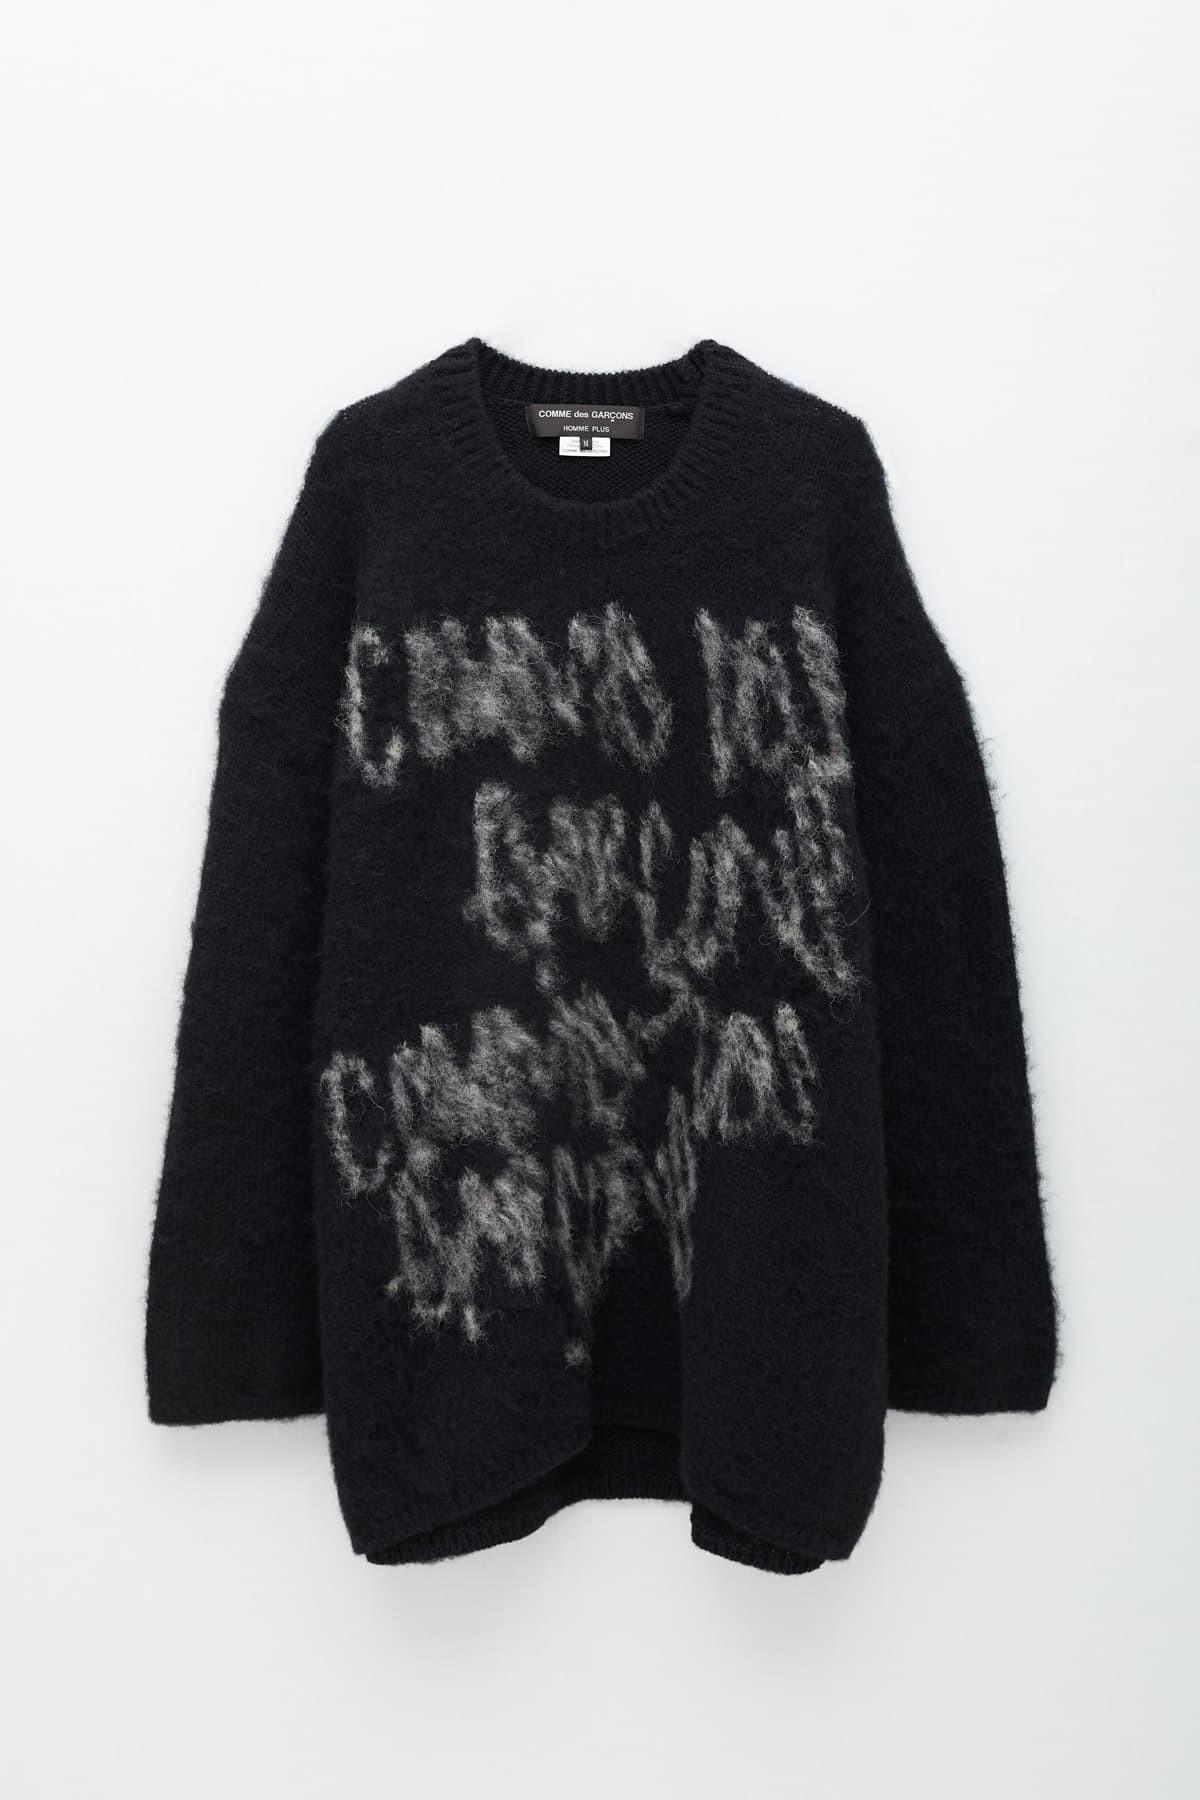 Shop A.P.C. White VPC T-Shirt